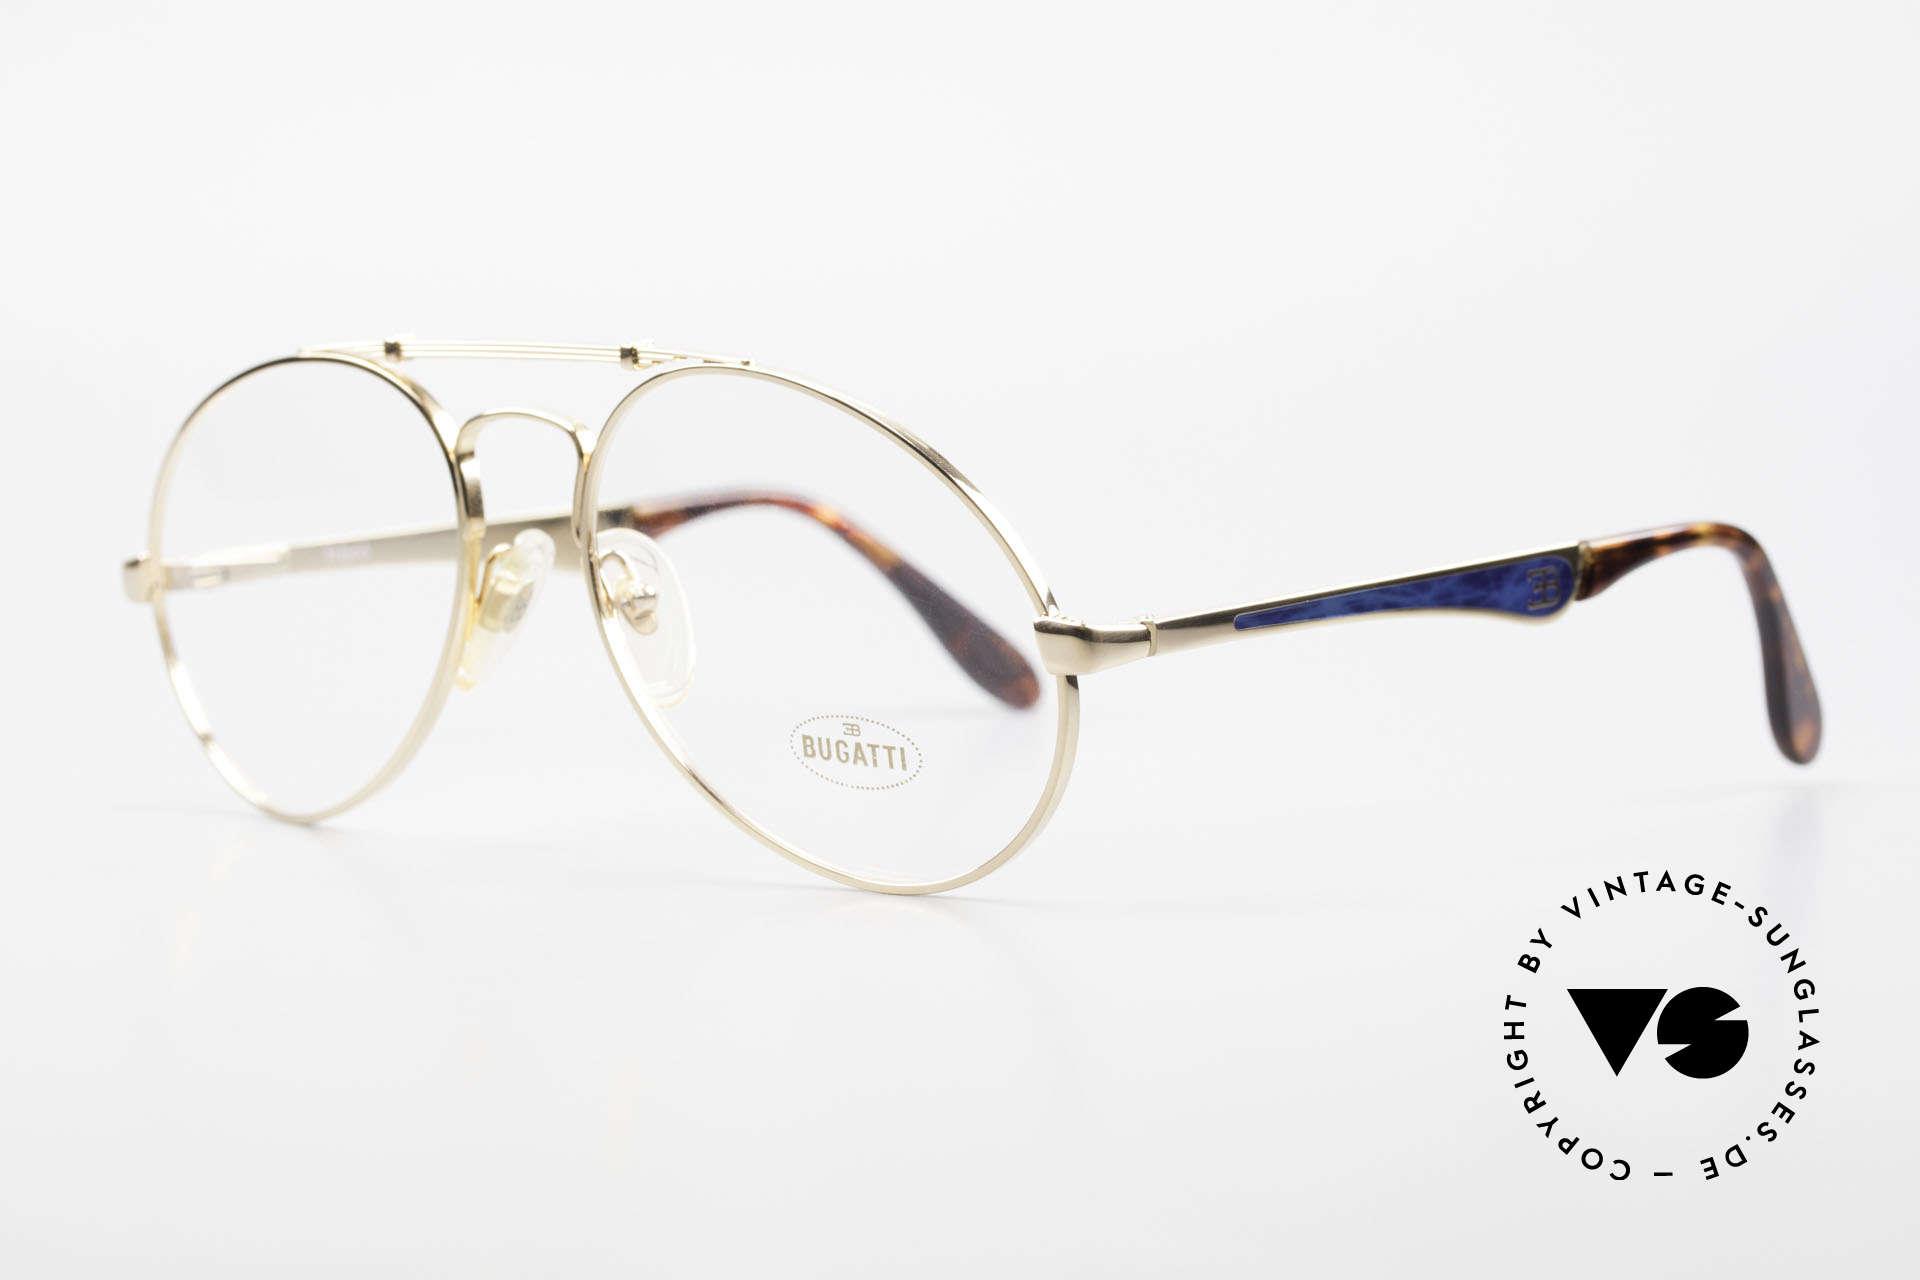 Bugatti 11945 Large Luxury 80's Eyeglasses, no tear drop, no aviator, but just Bugatti shape, Made for Men